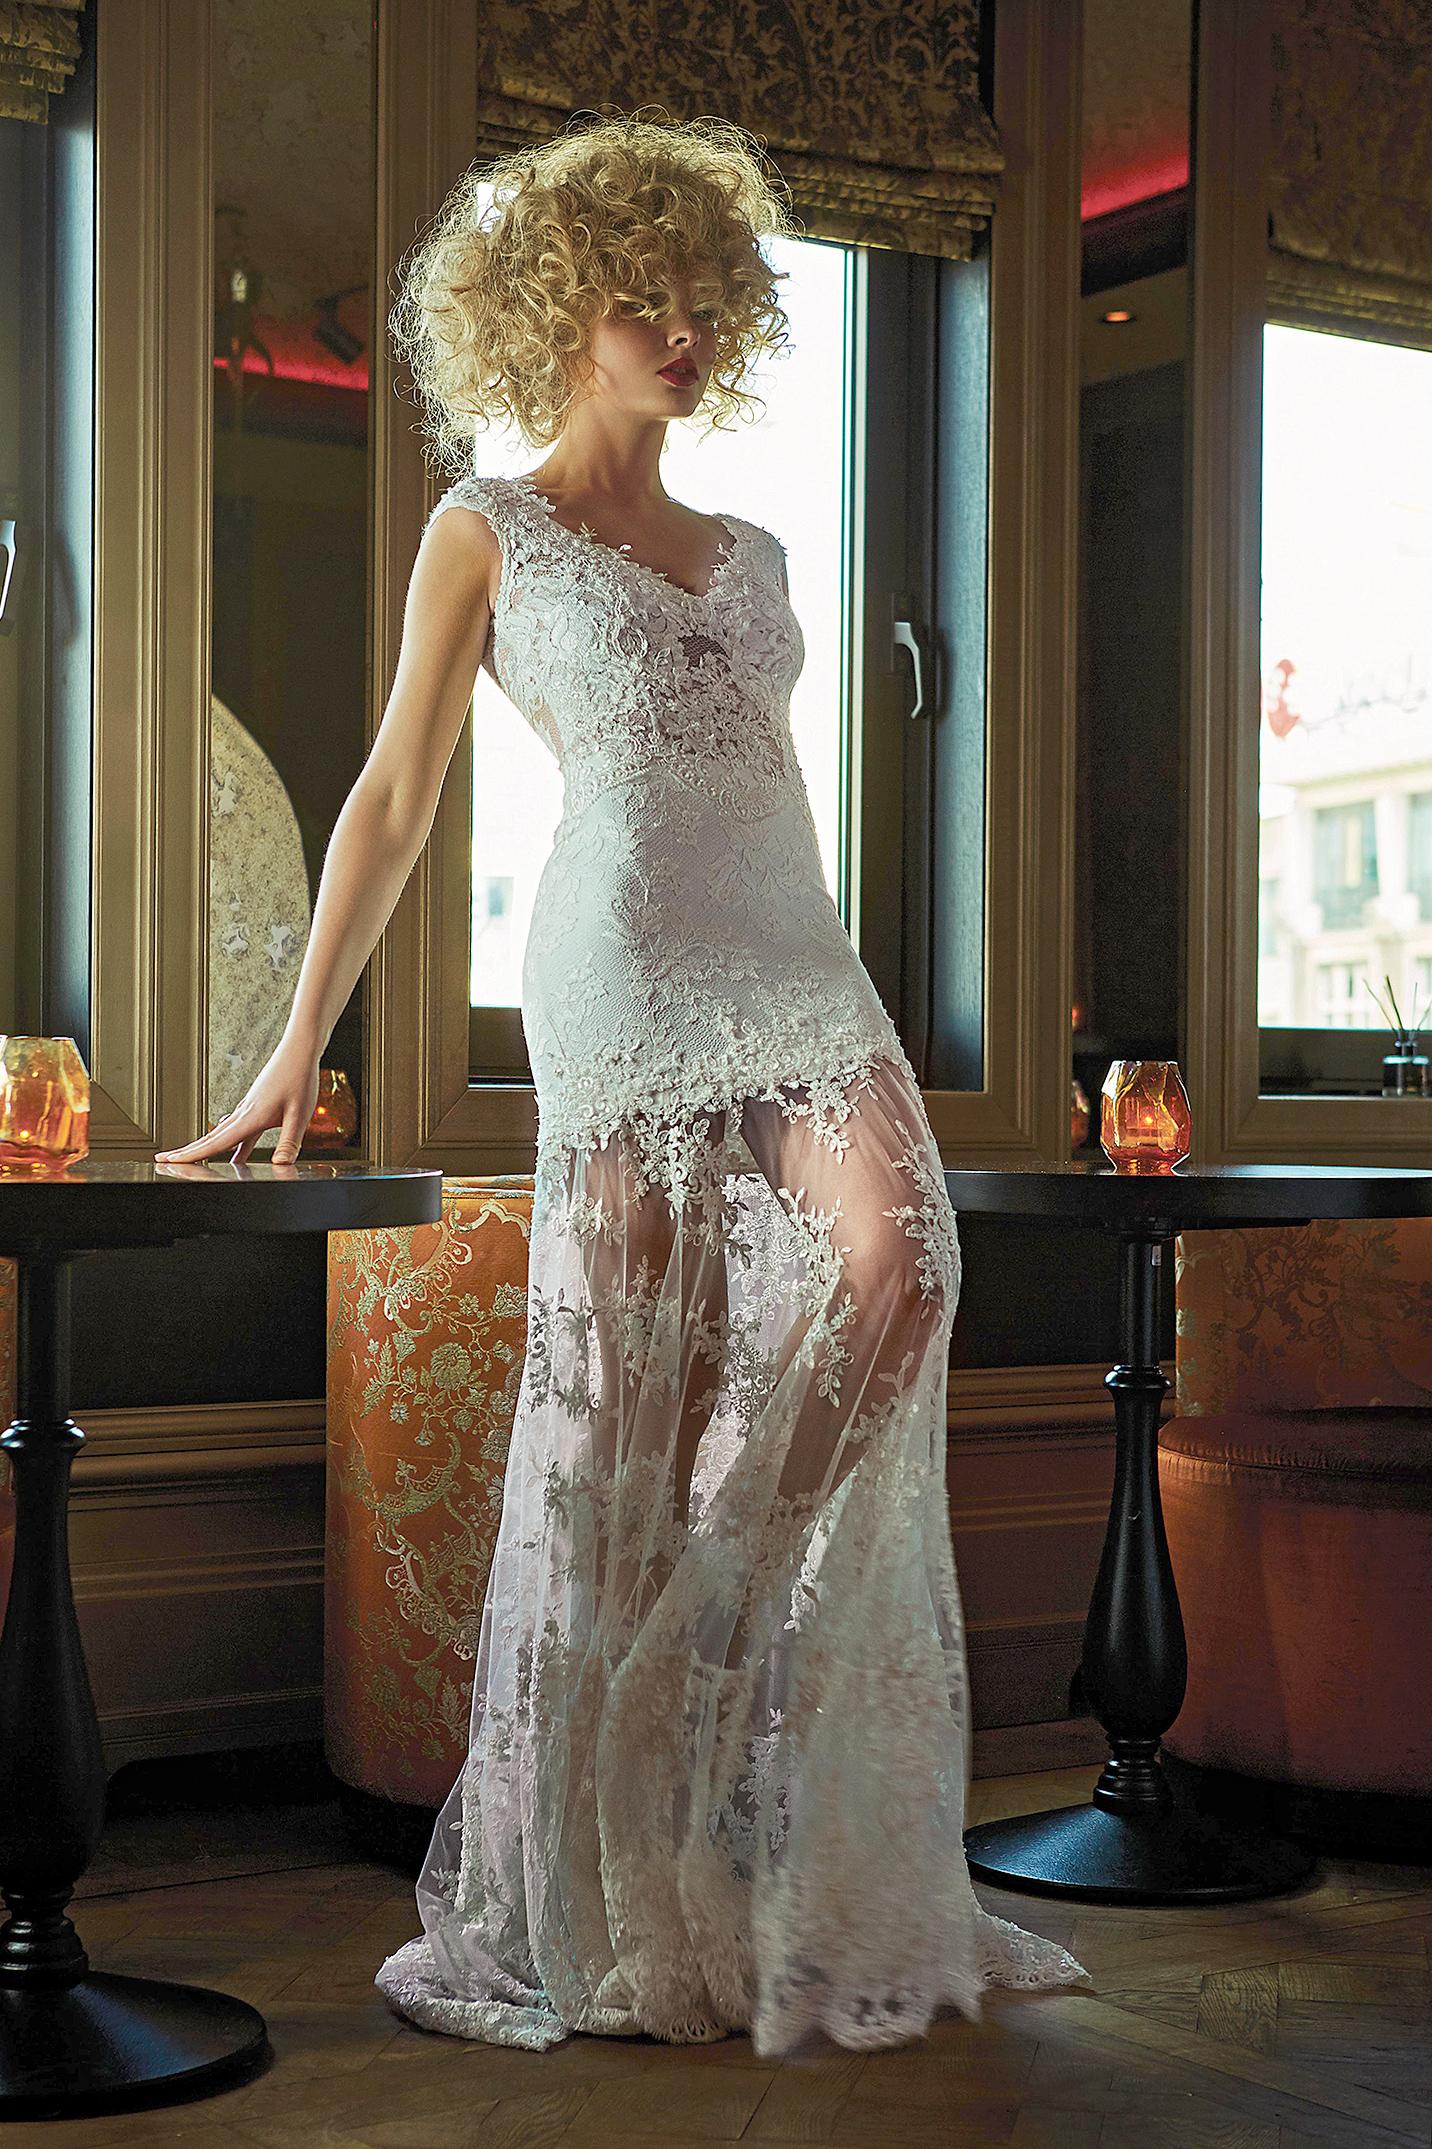 olvi wedding dress spring 2019 v-neck sheath with sheer skirt